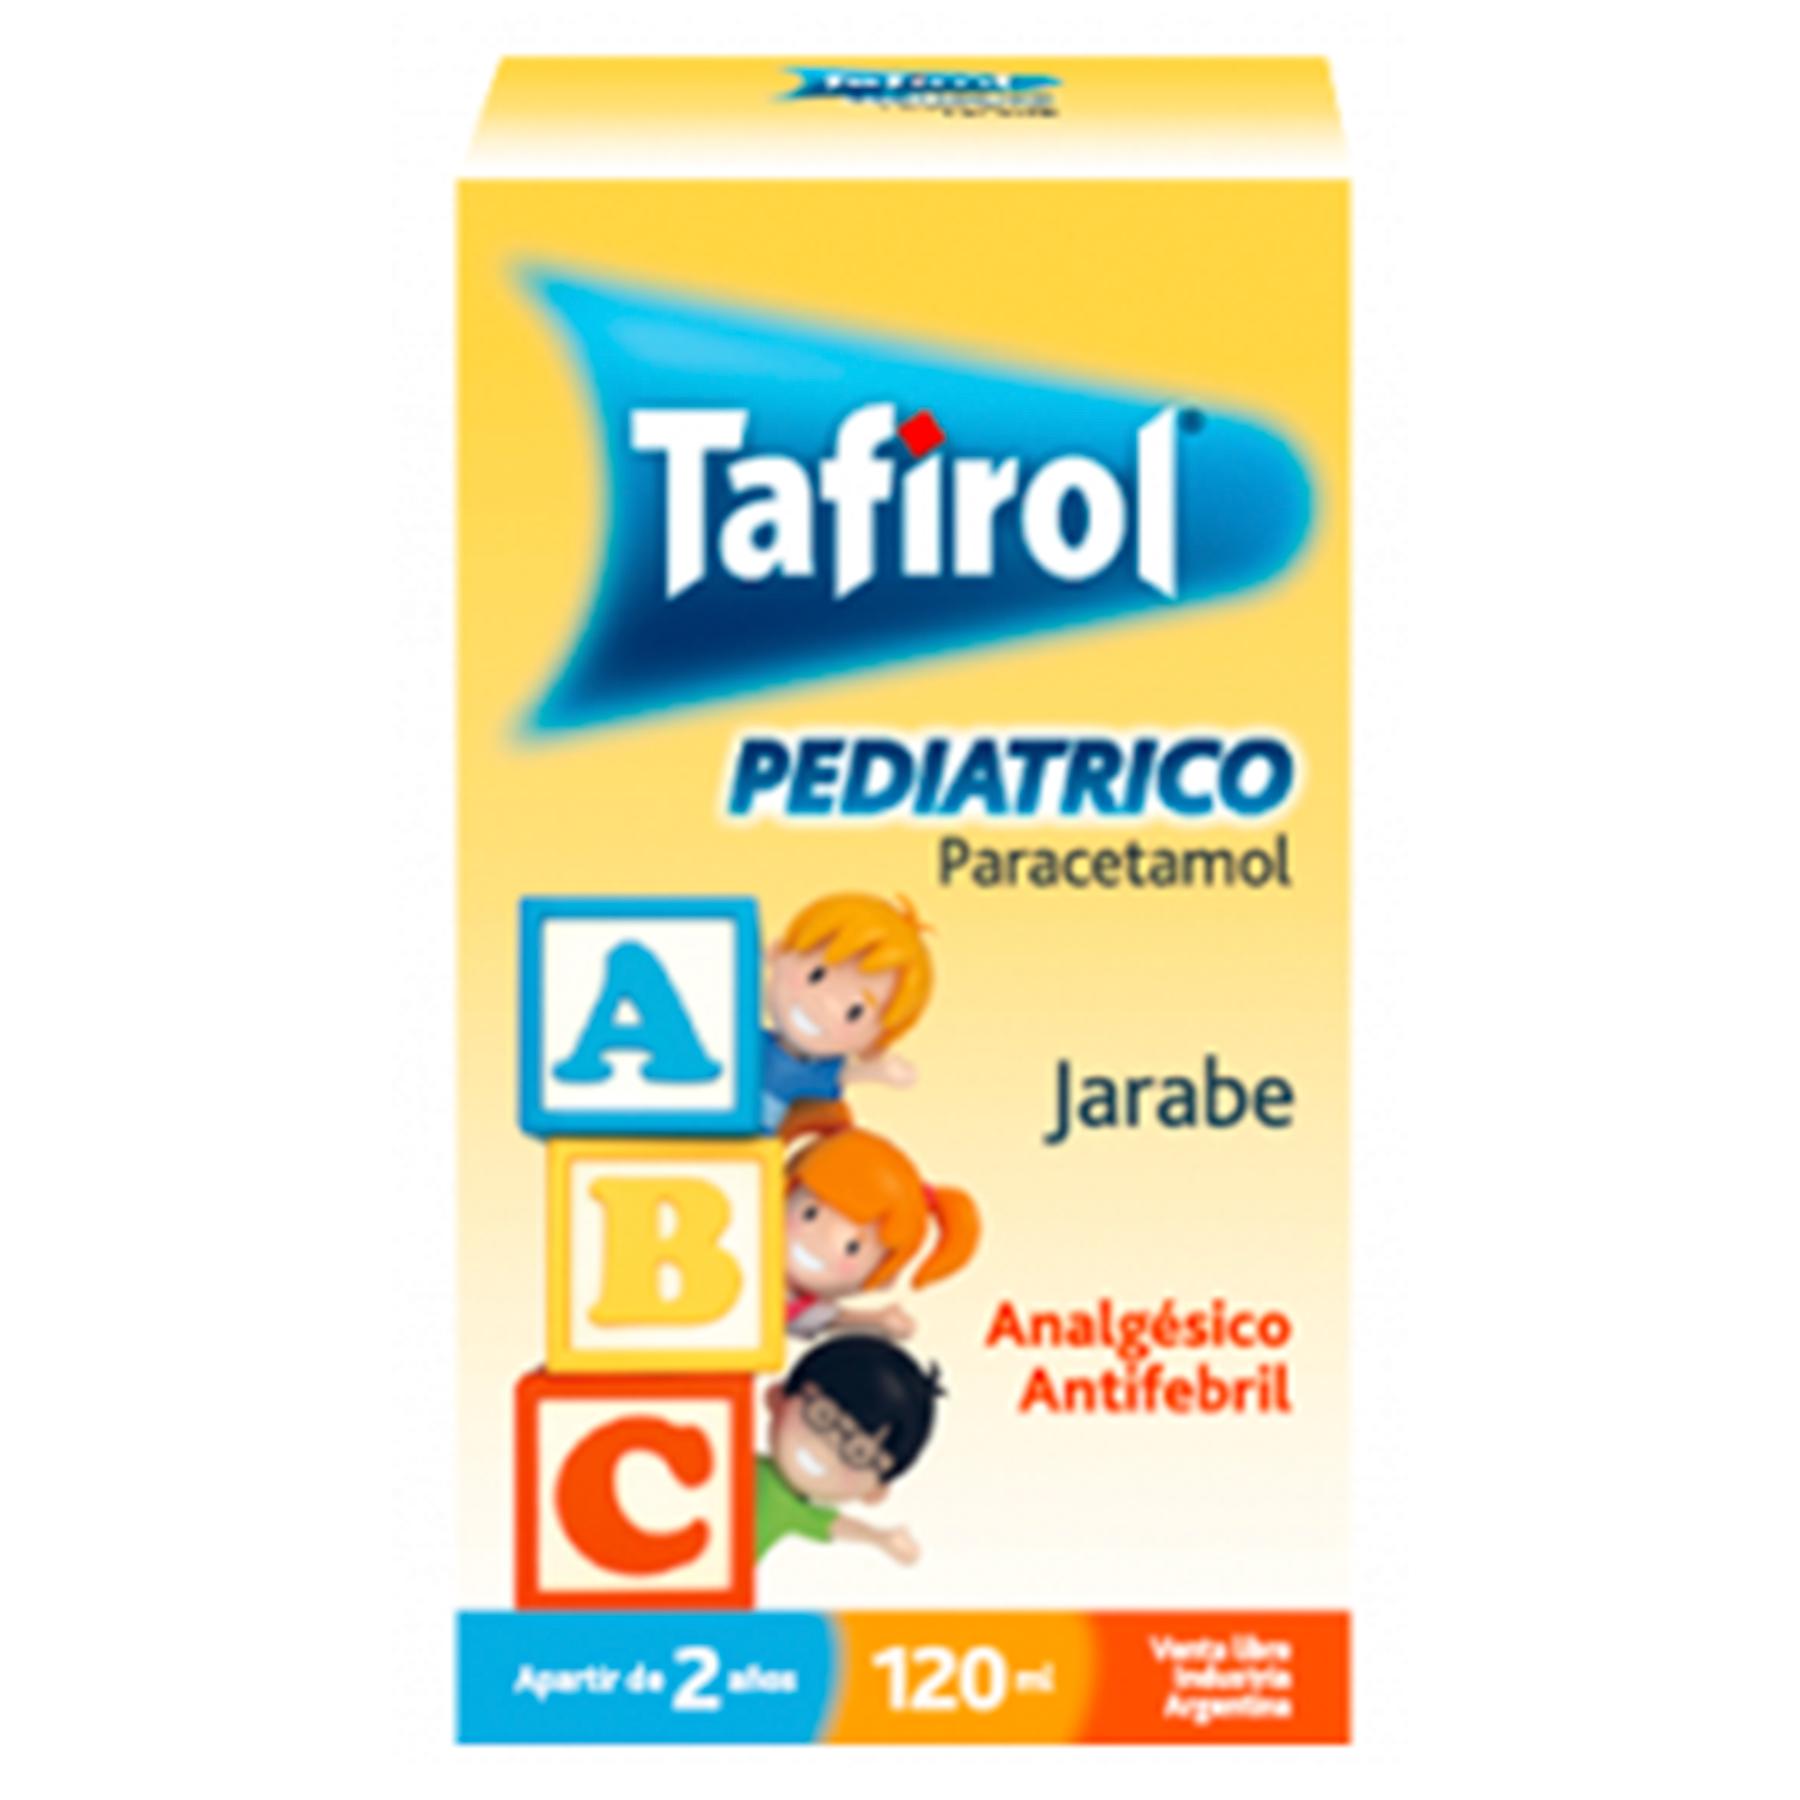 Jarabe Pediátrico 120ml